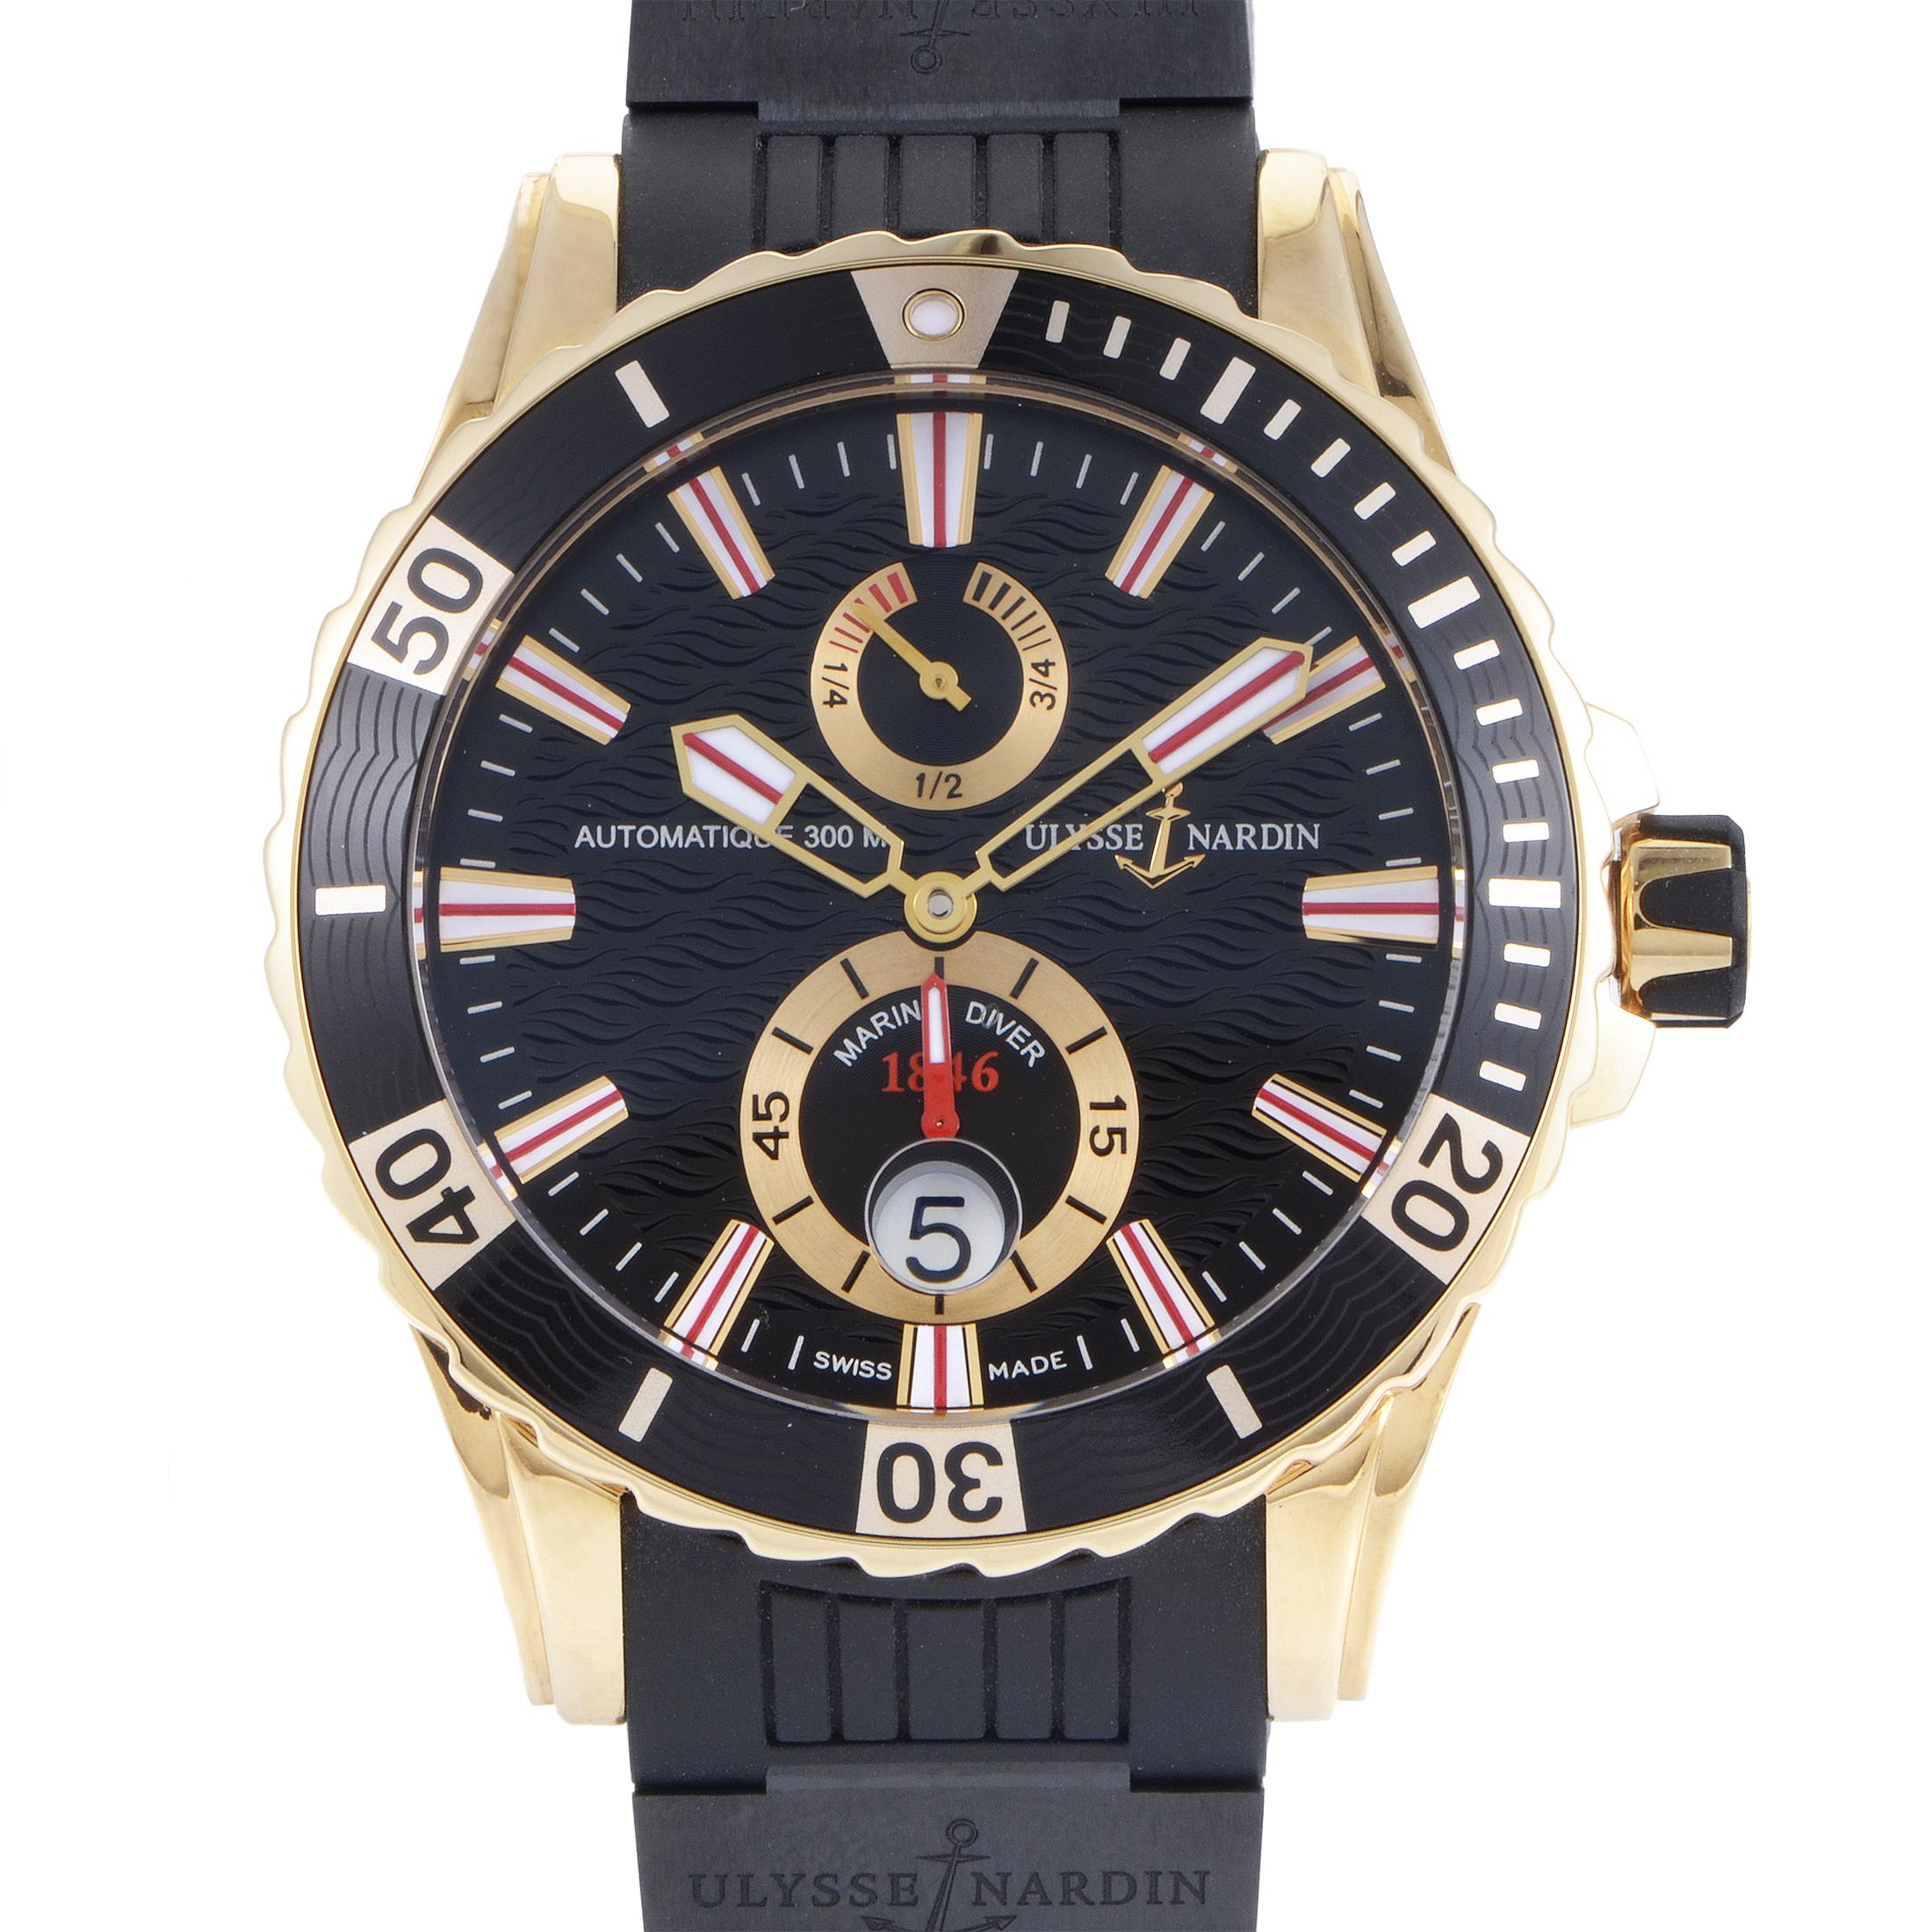 Maxi Marine Diver Men's Automatic Chronograph Watch 266-10-3C/92